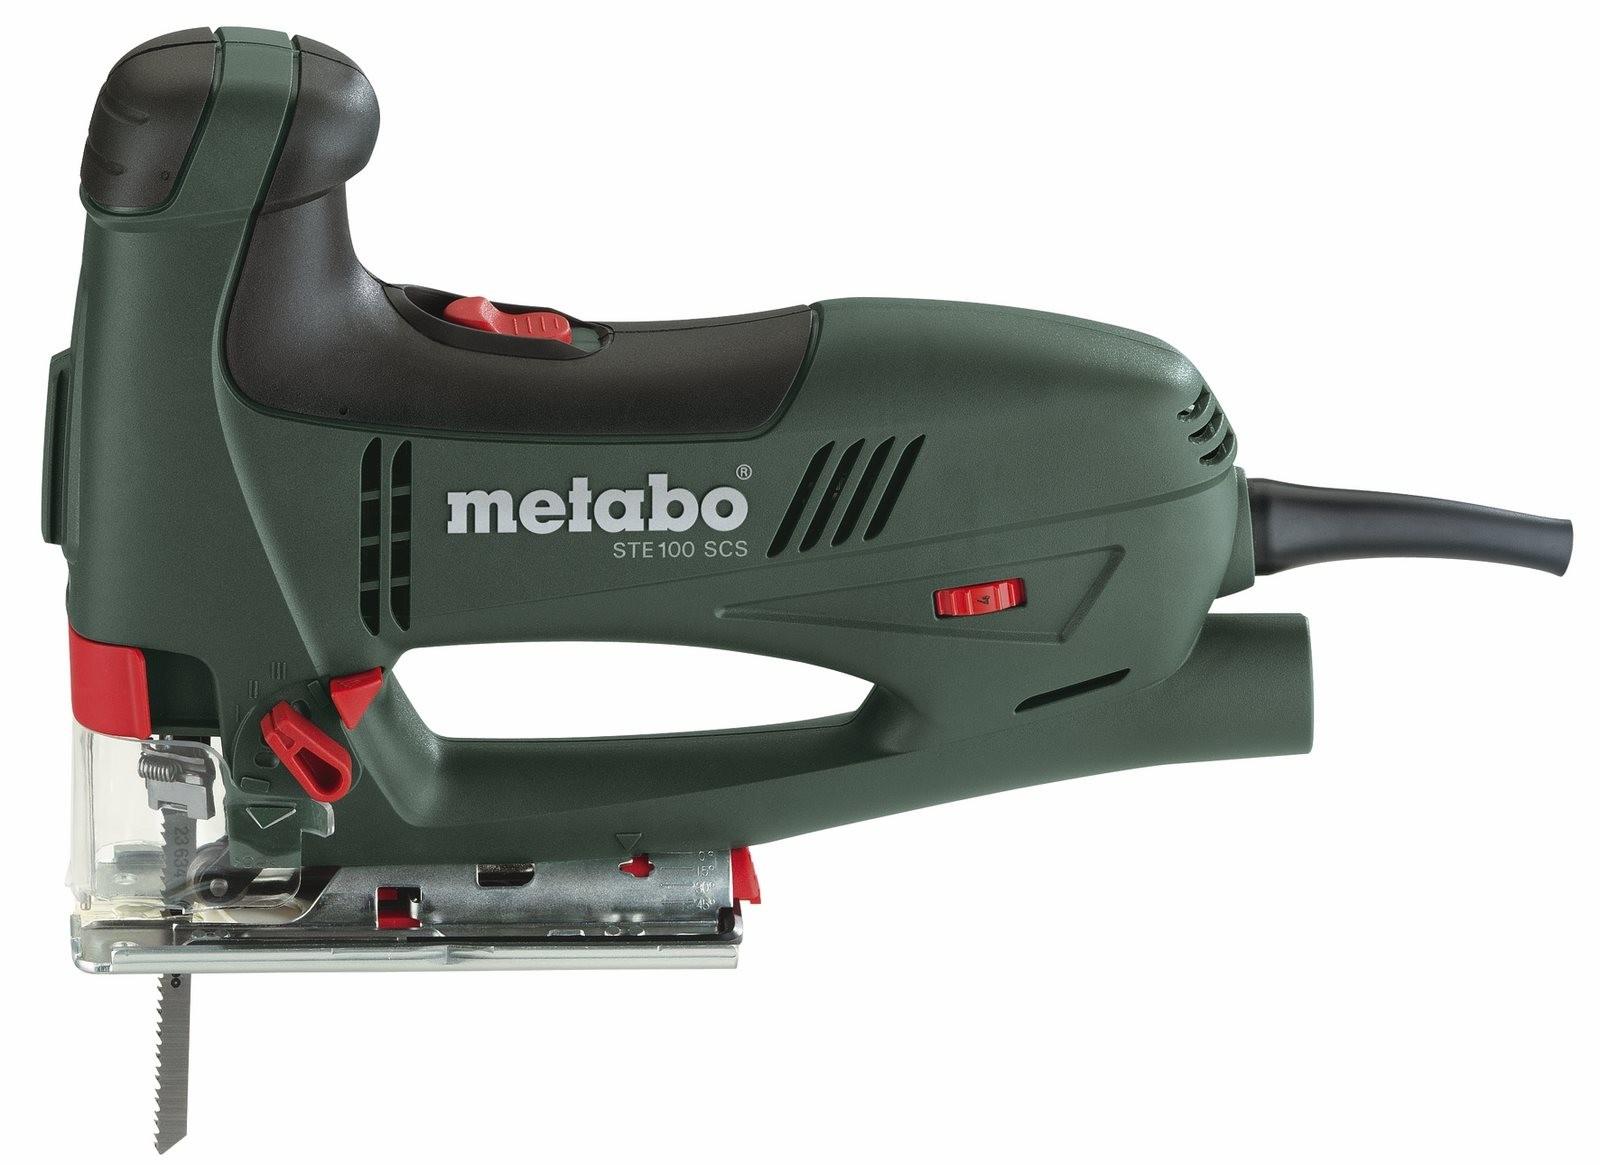 metabo 630 watt ste 100 scs. Black Bedroom Furniture Sets. Home Design Ideas